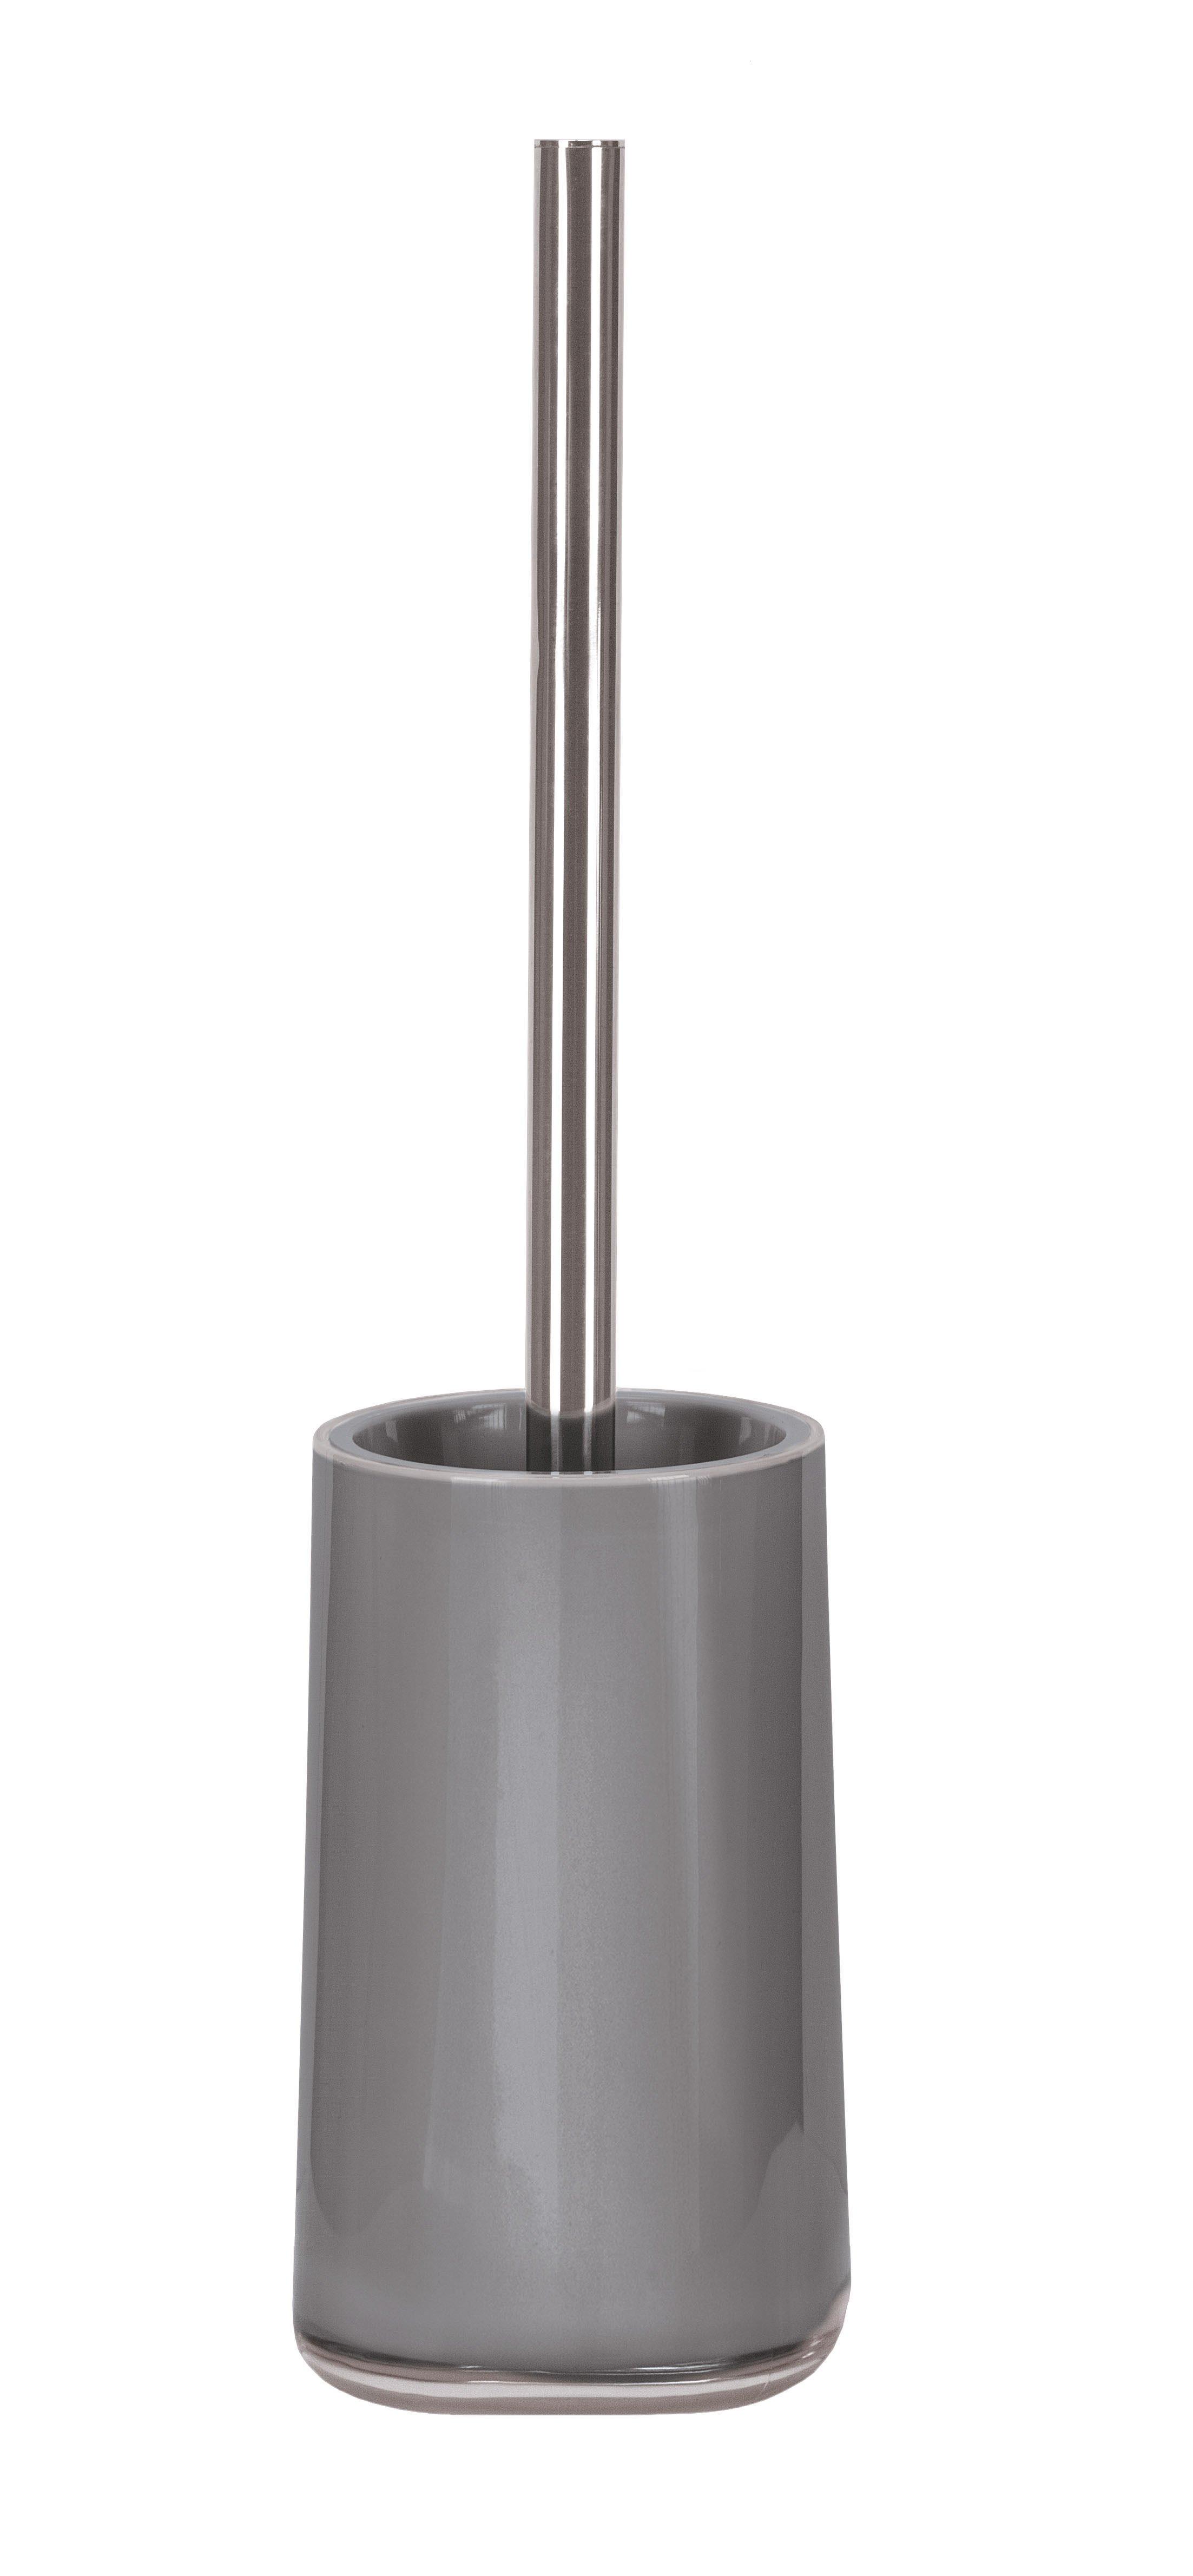 WC-Bürstenhalter Mable Platin B:9,6cm